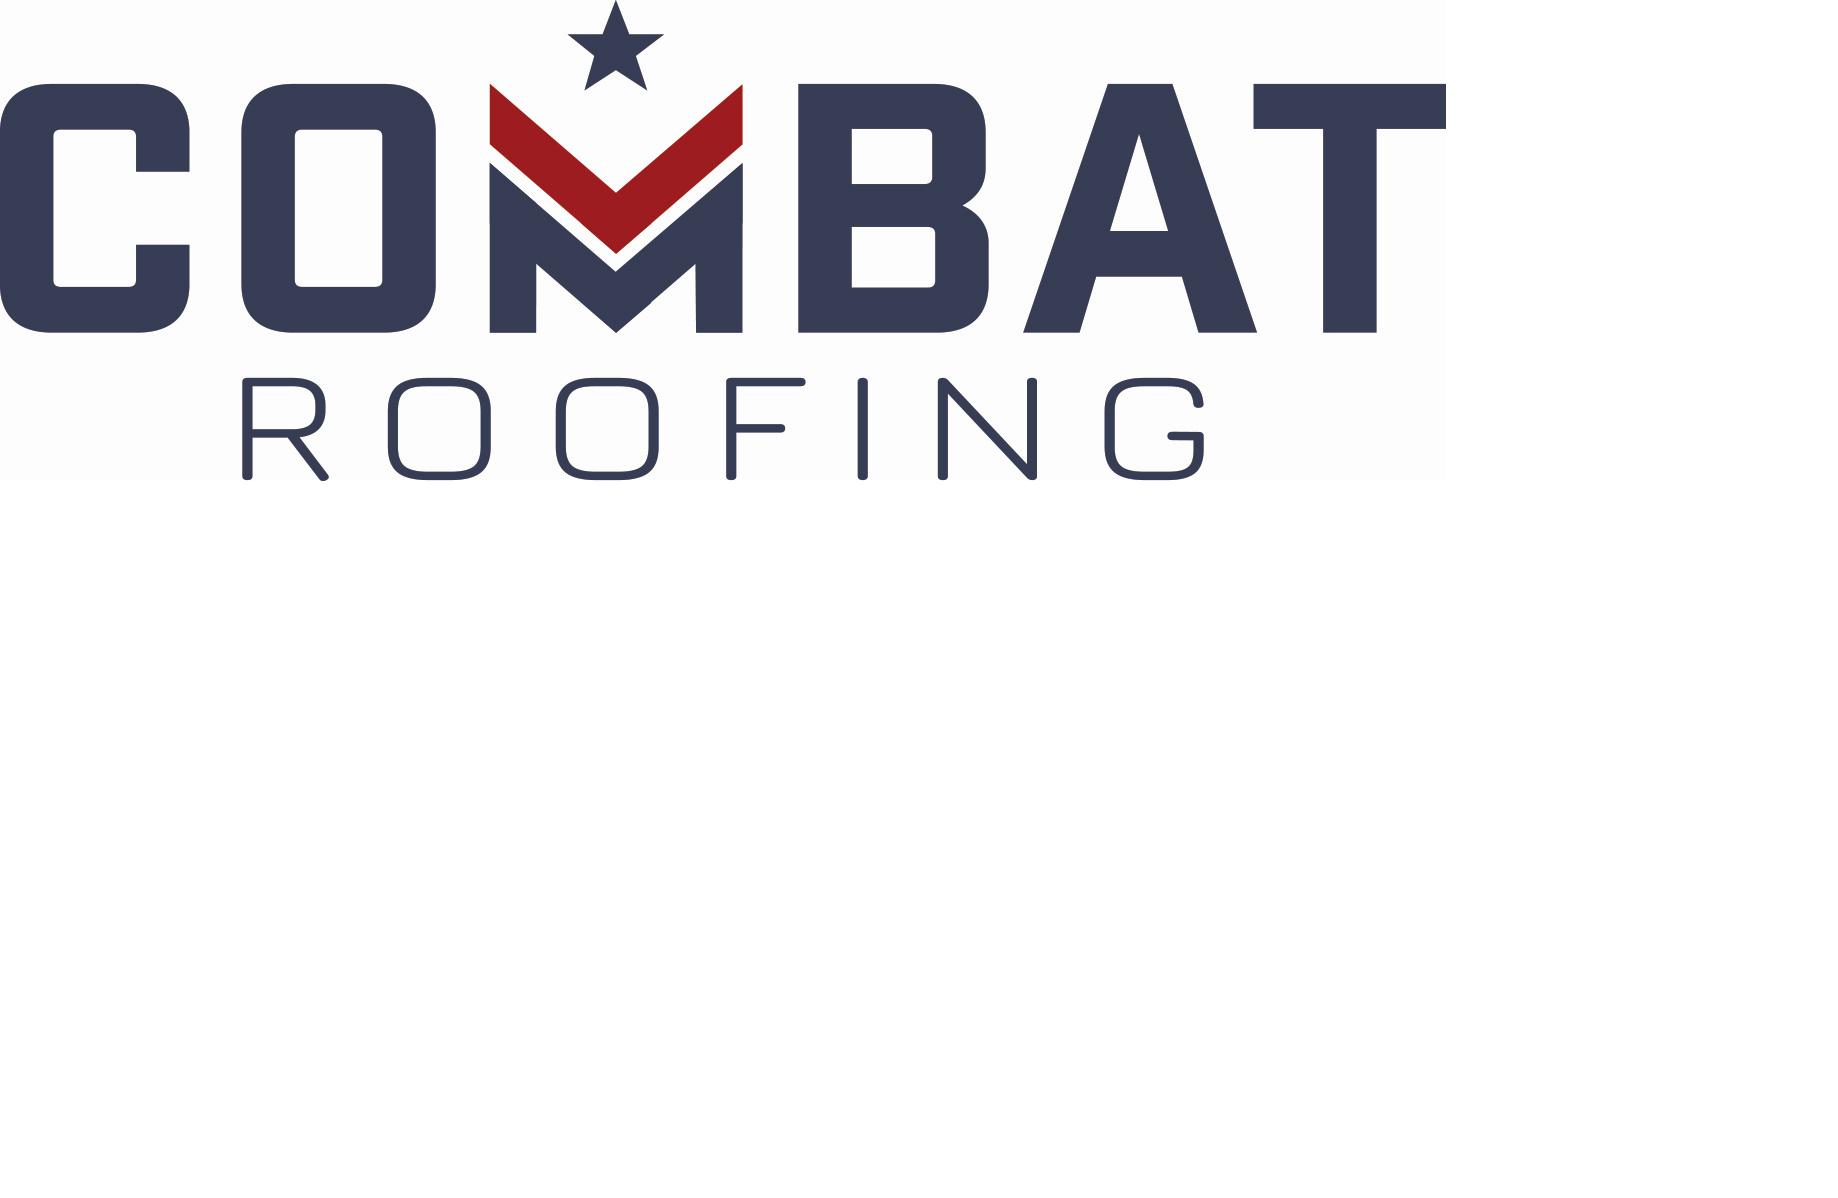 Combat Roofing Logo